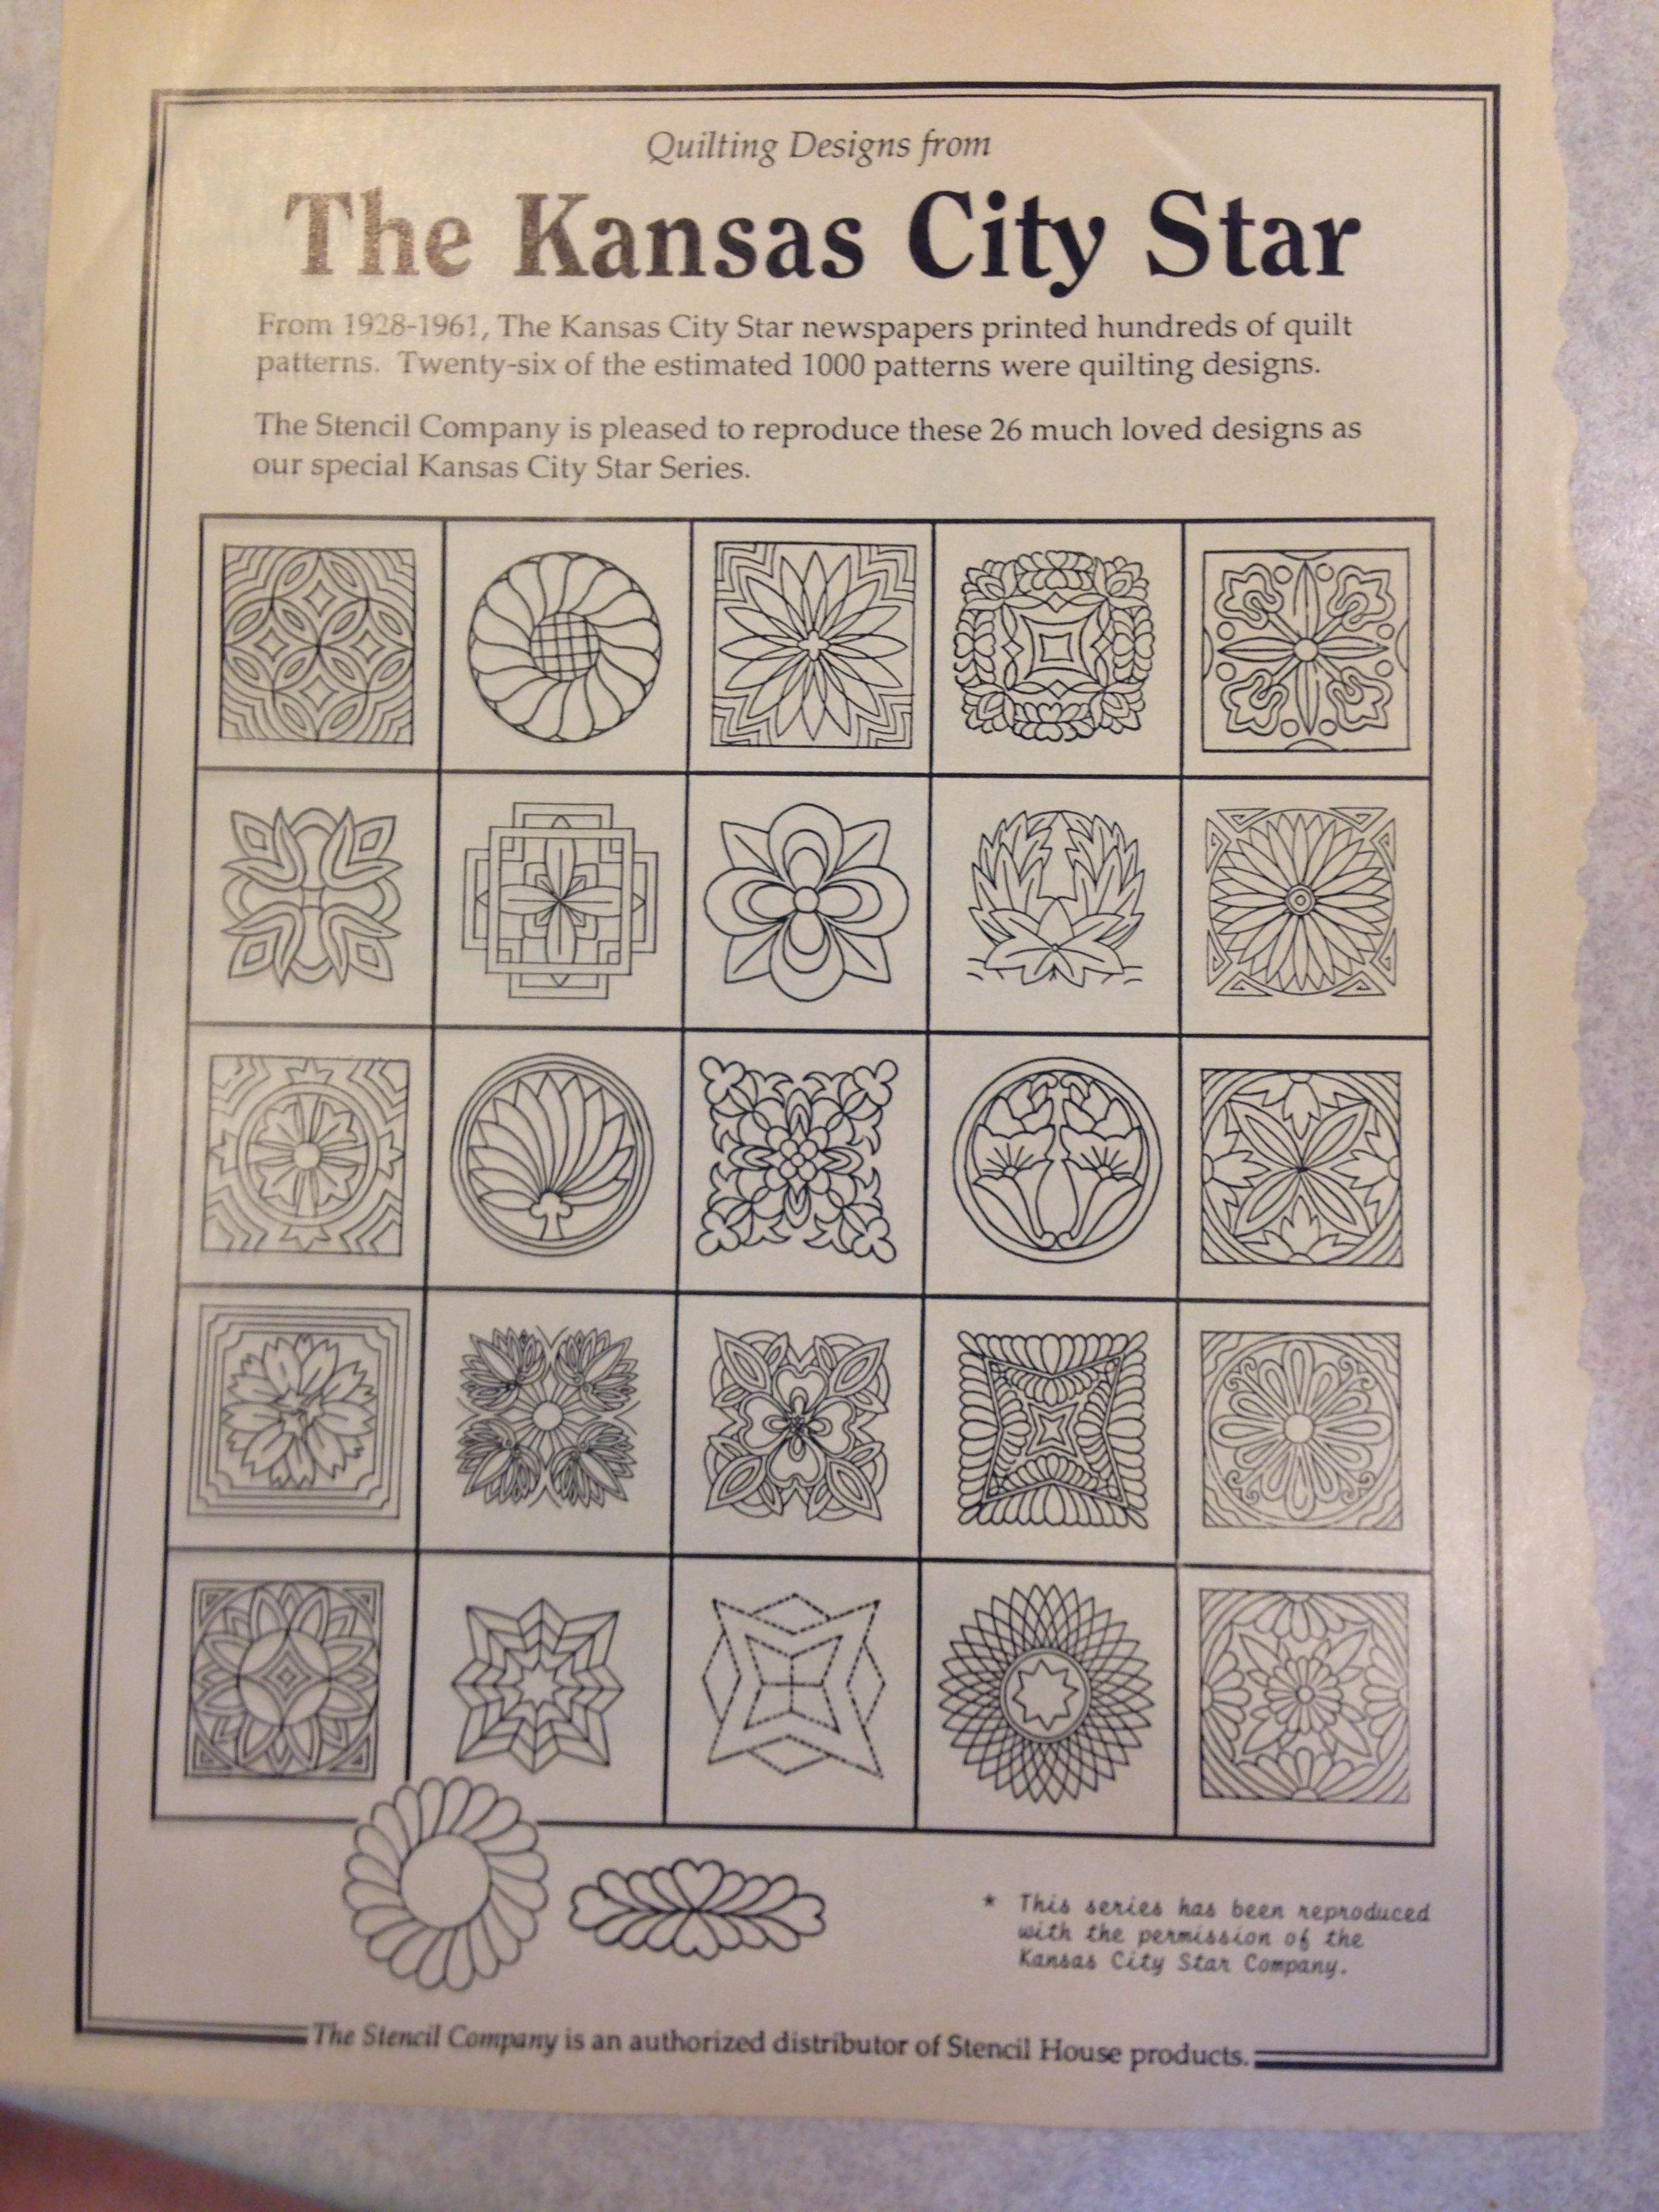 The Kansas City Star Block Ideas Antique Quilts Patterns Vintage Quilts Patterns Star Quilt Patterns